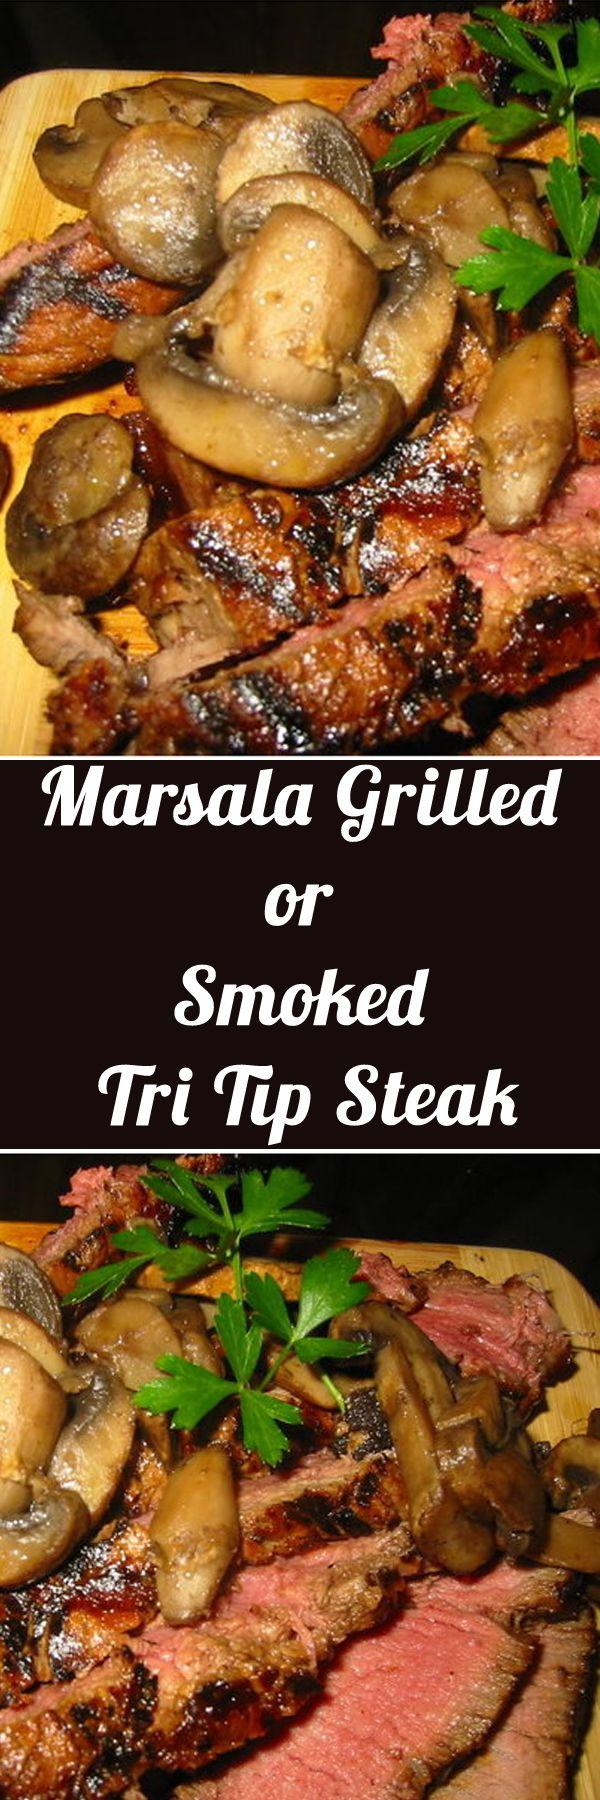 Marsala Grilled or Smoked Tri Tip Steak recipezazz.com